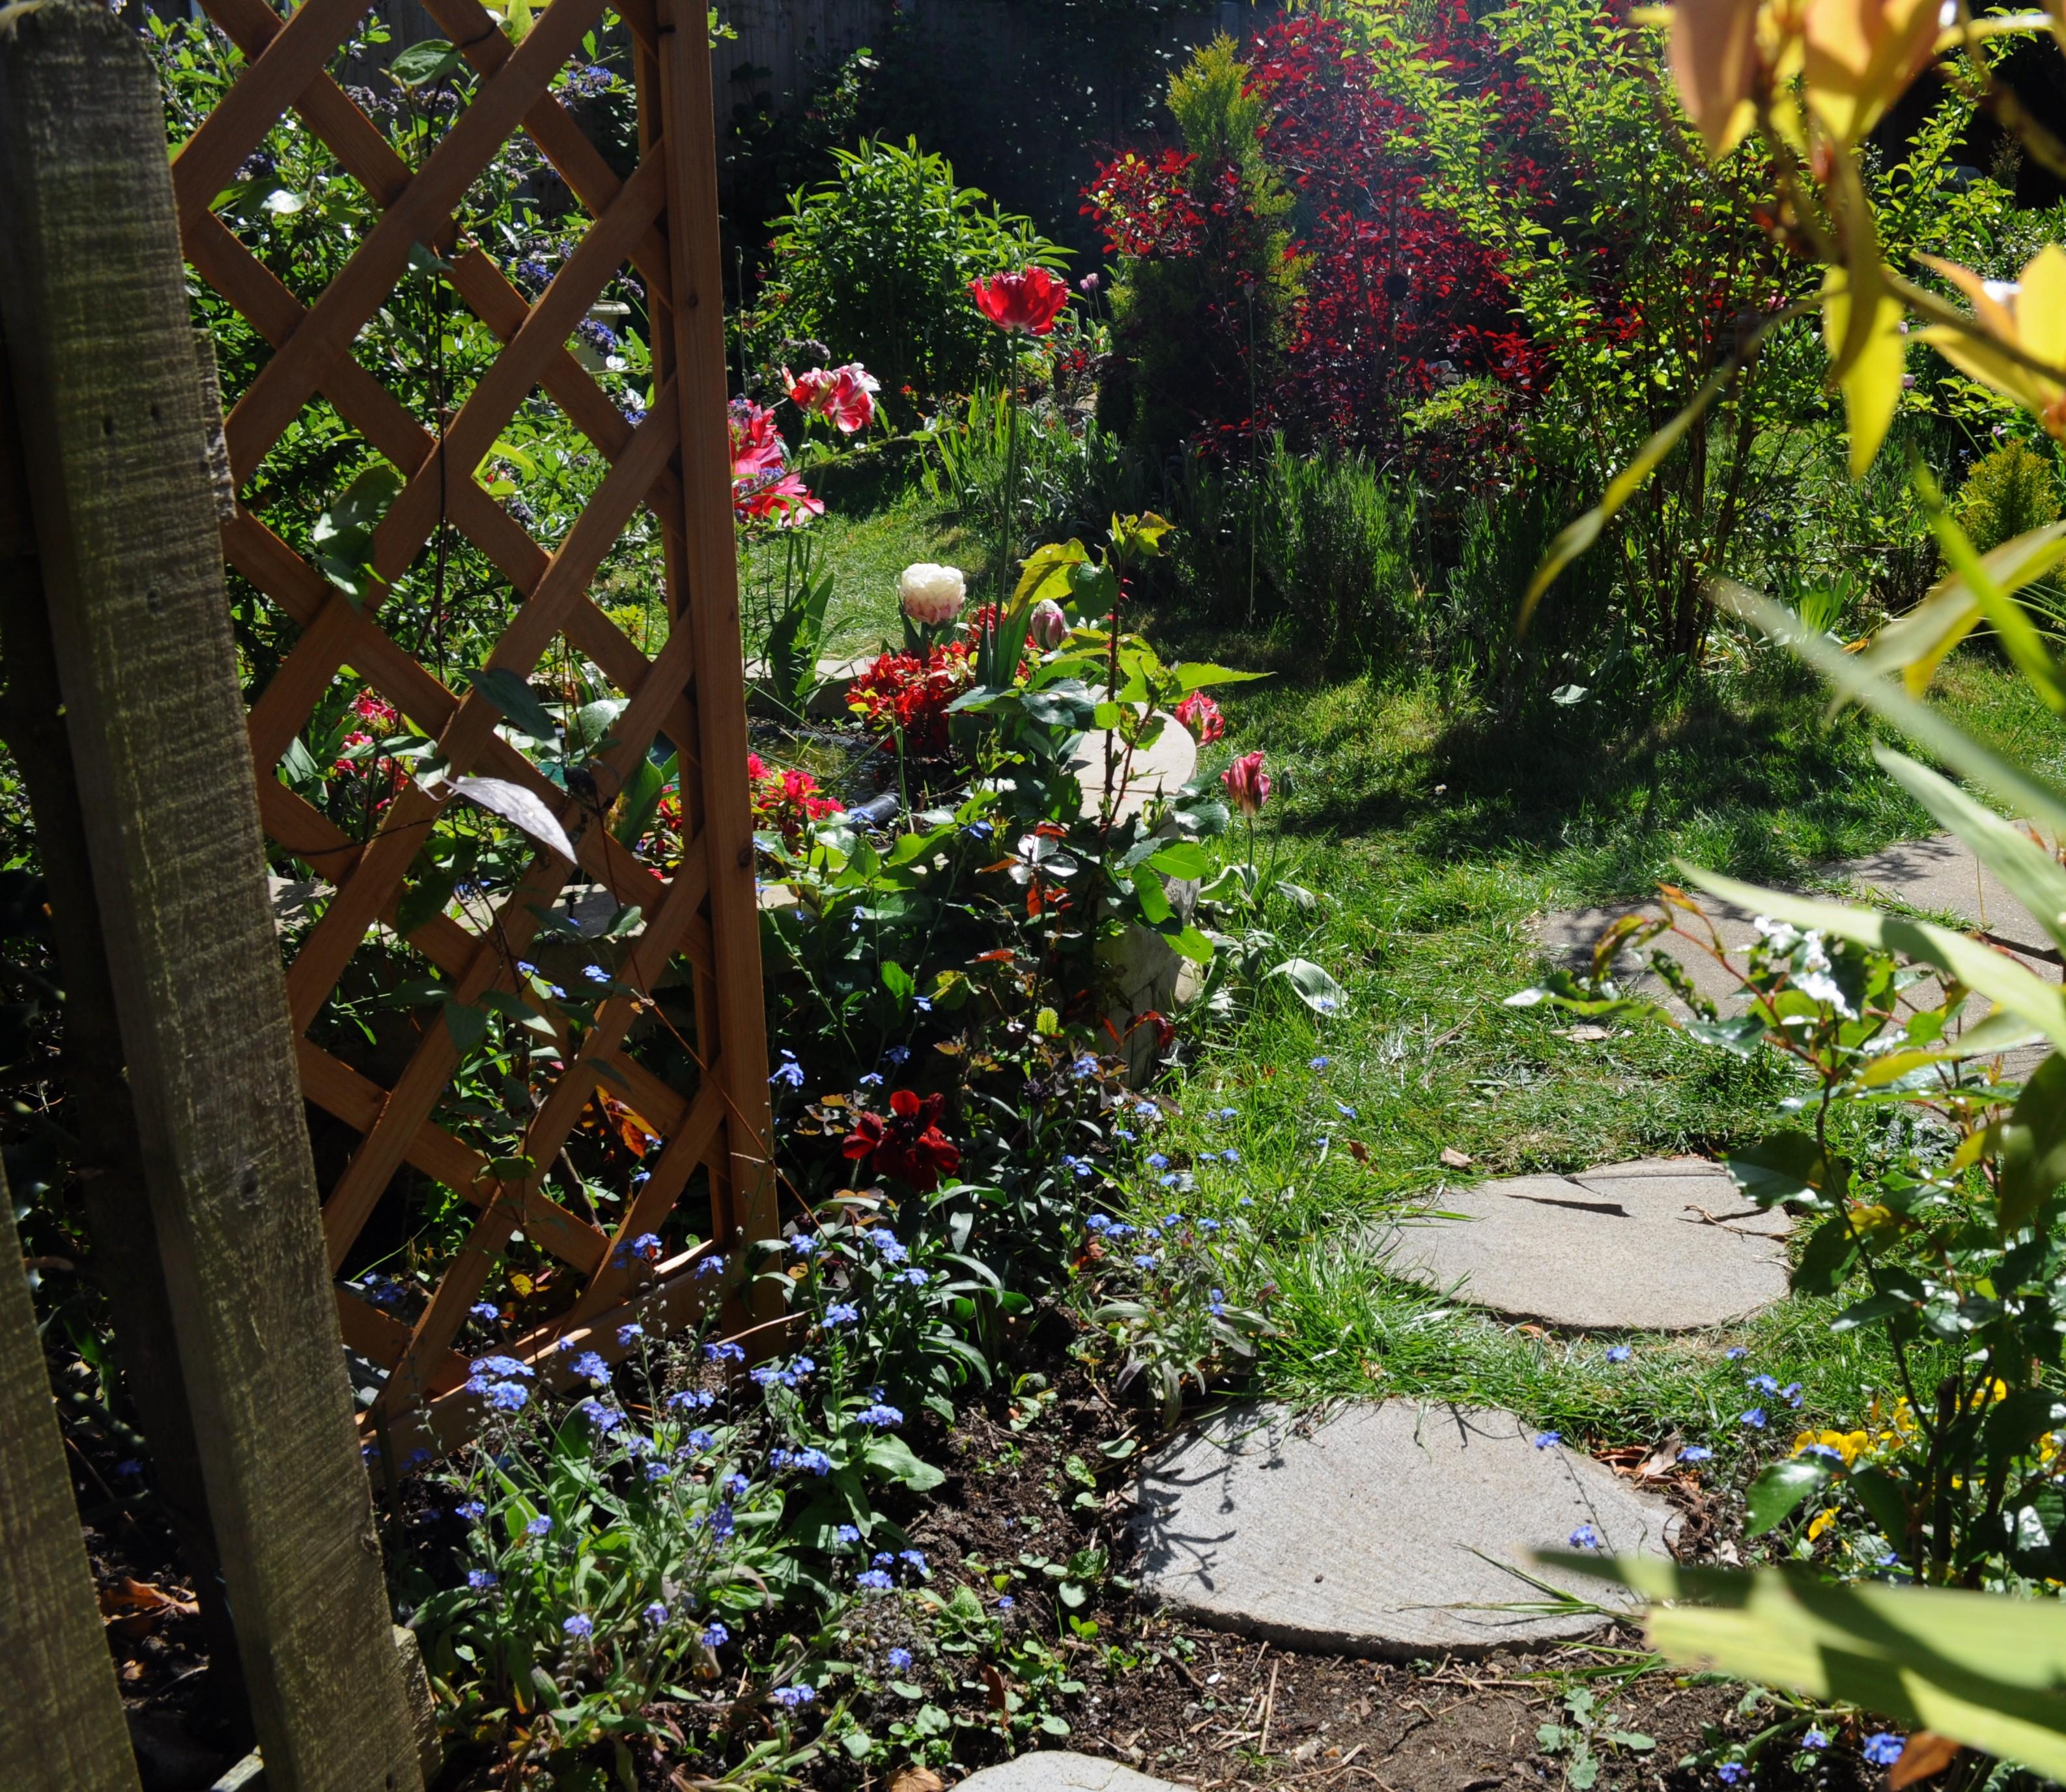 Beyond The Garden Gate By Forestina Fotos On Deviantart